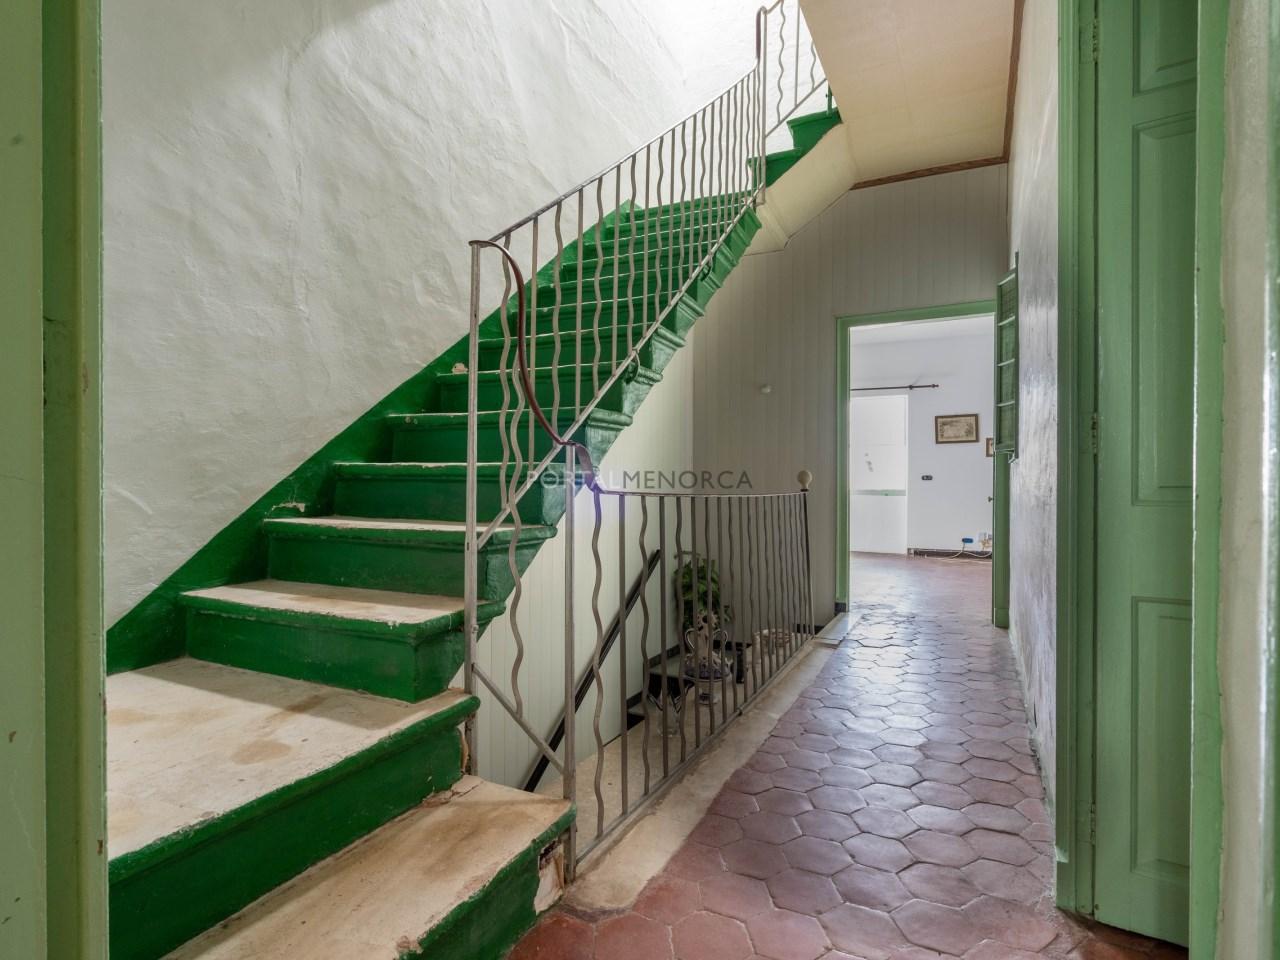 acheter maison charme minorque (3)